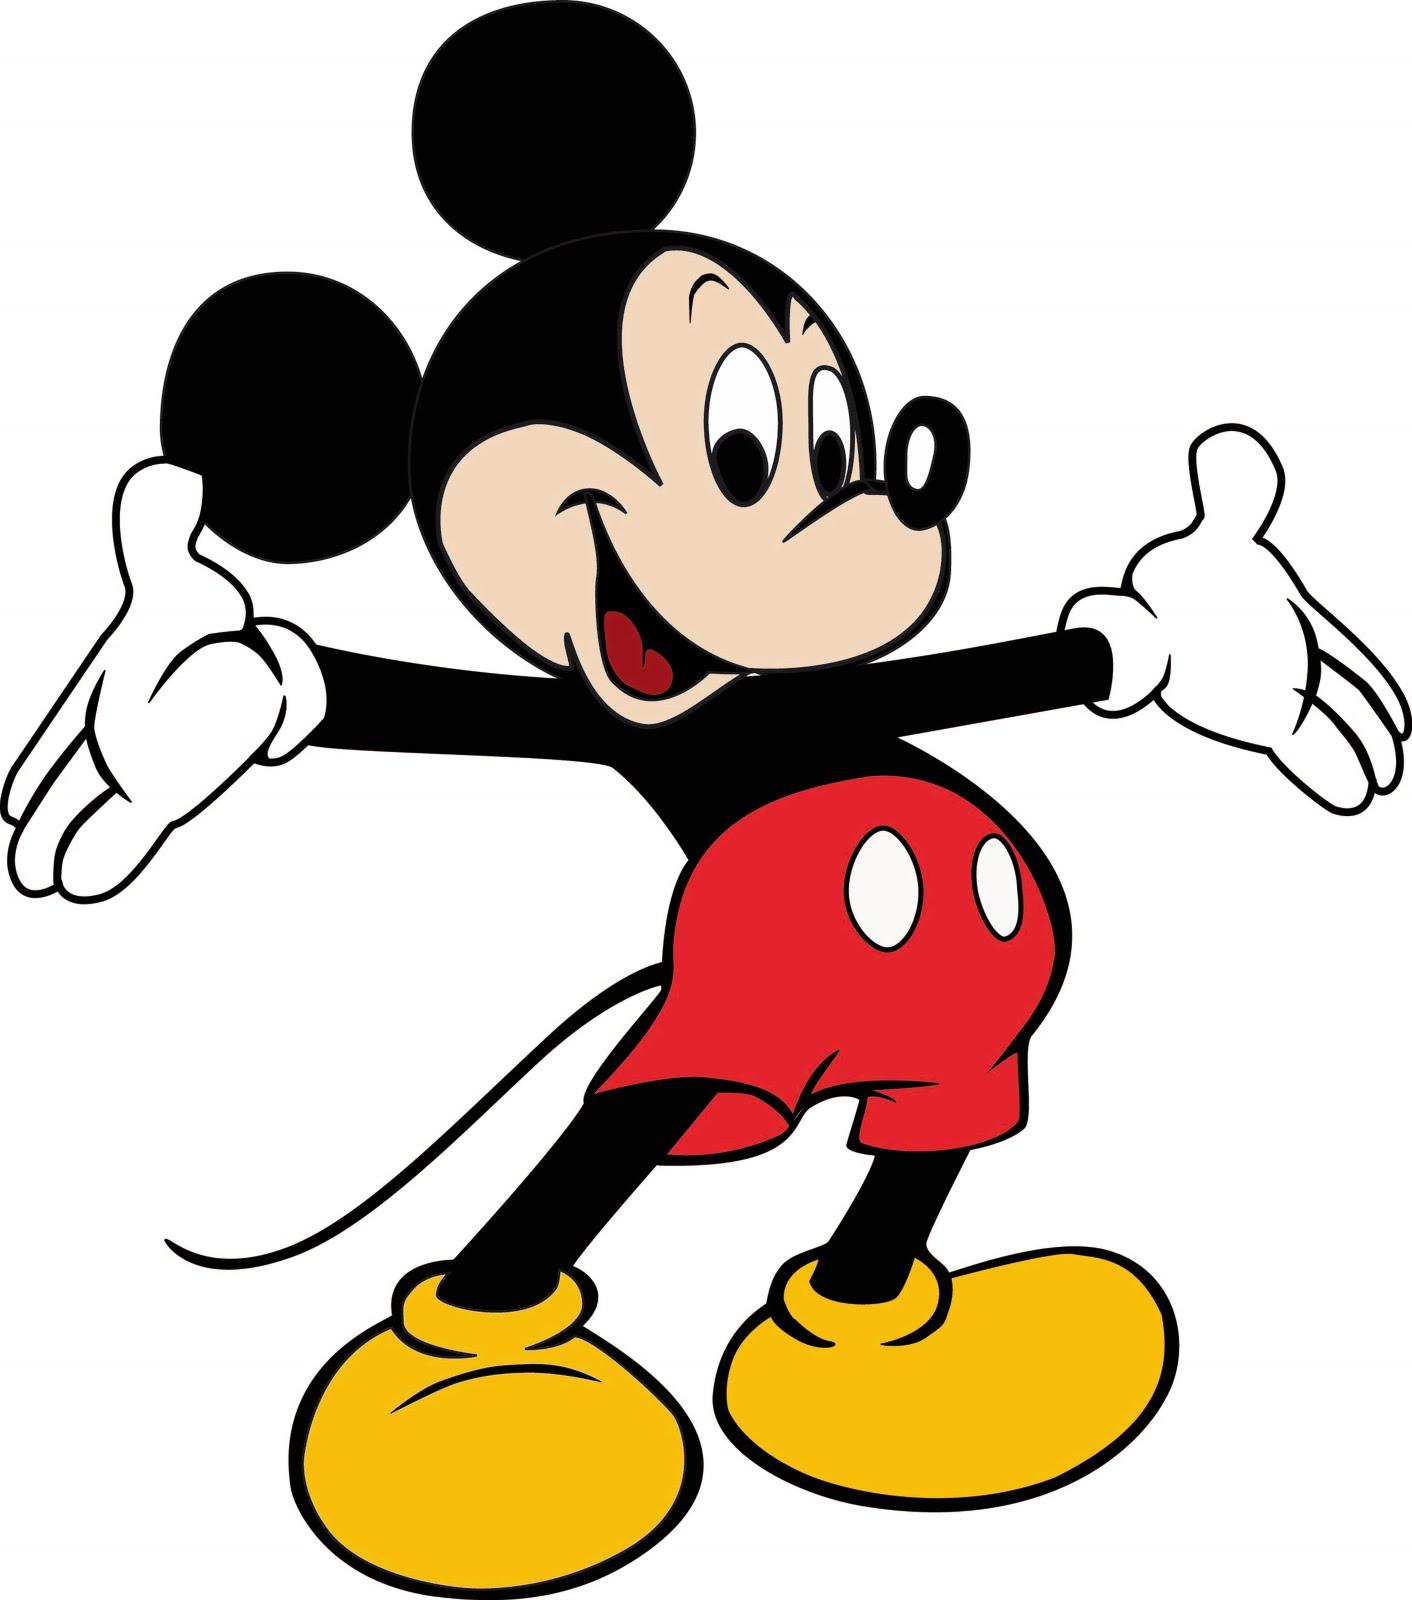 Dessins en couleurs imprimer mickey mouse num ro 21654 - Mickey mouse dessin ...